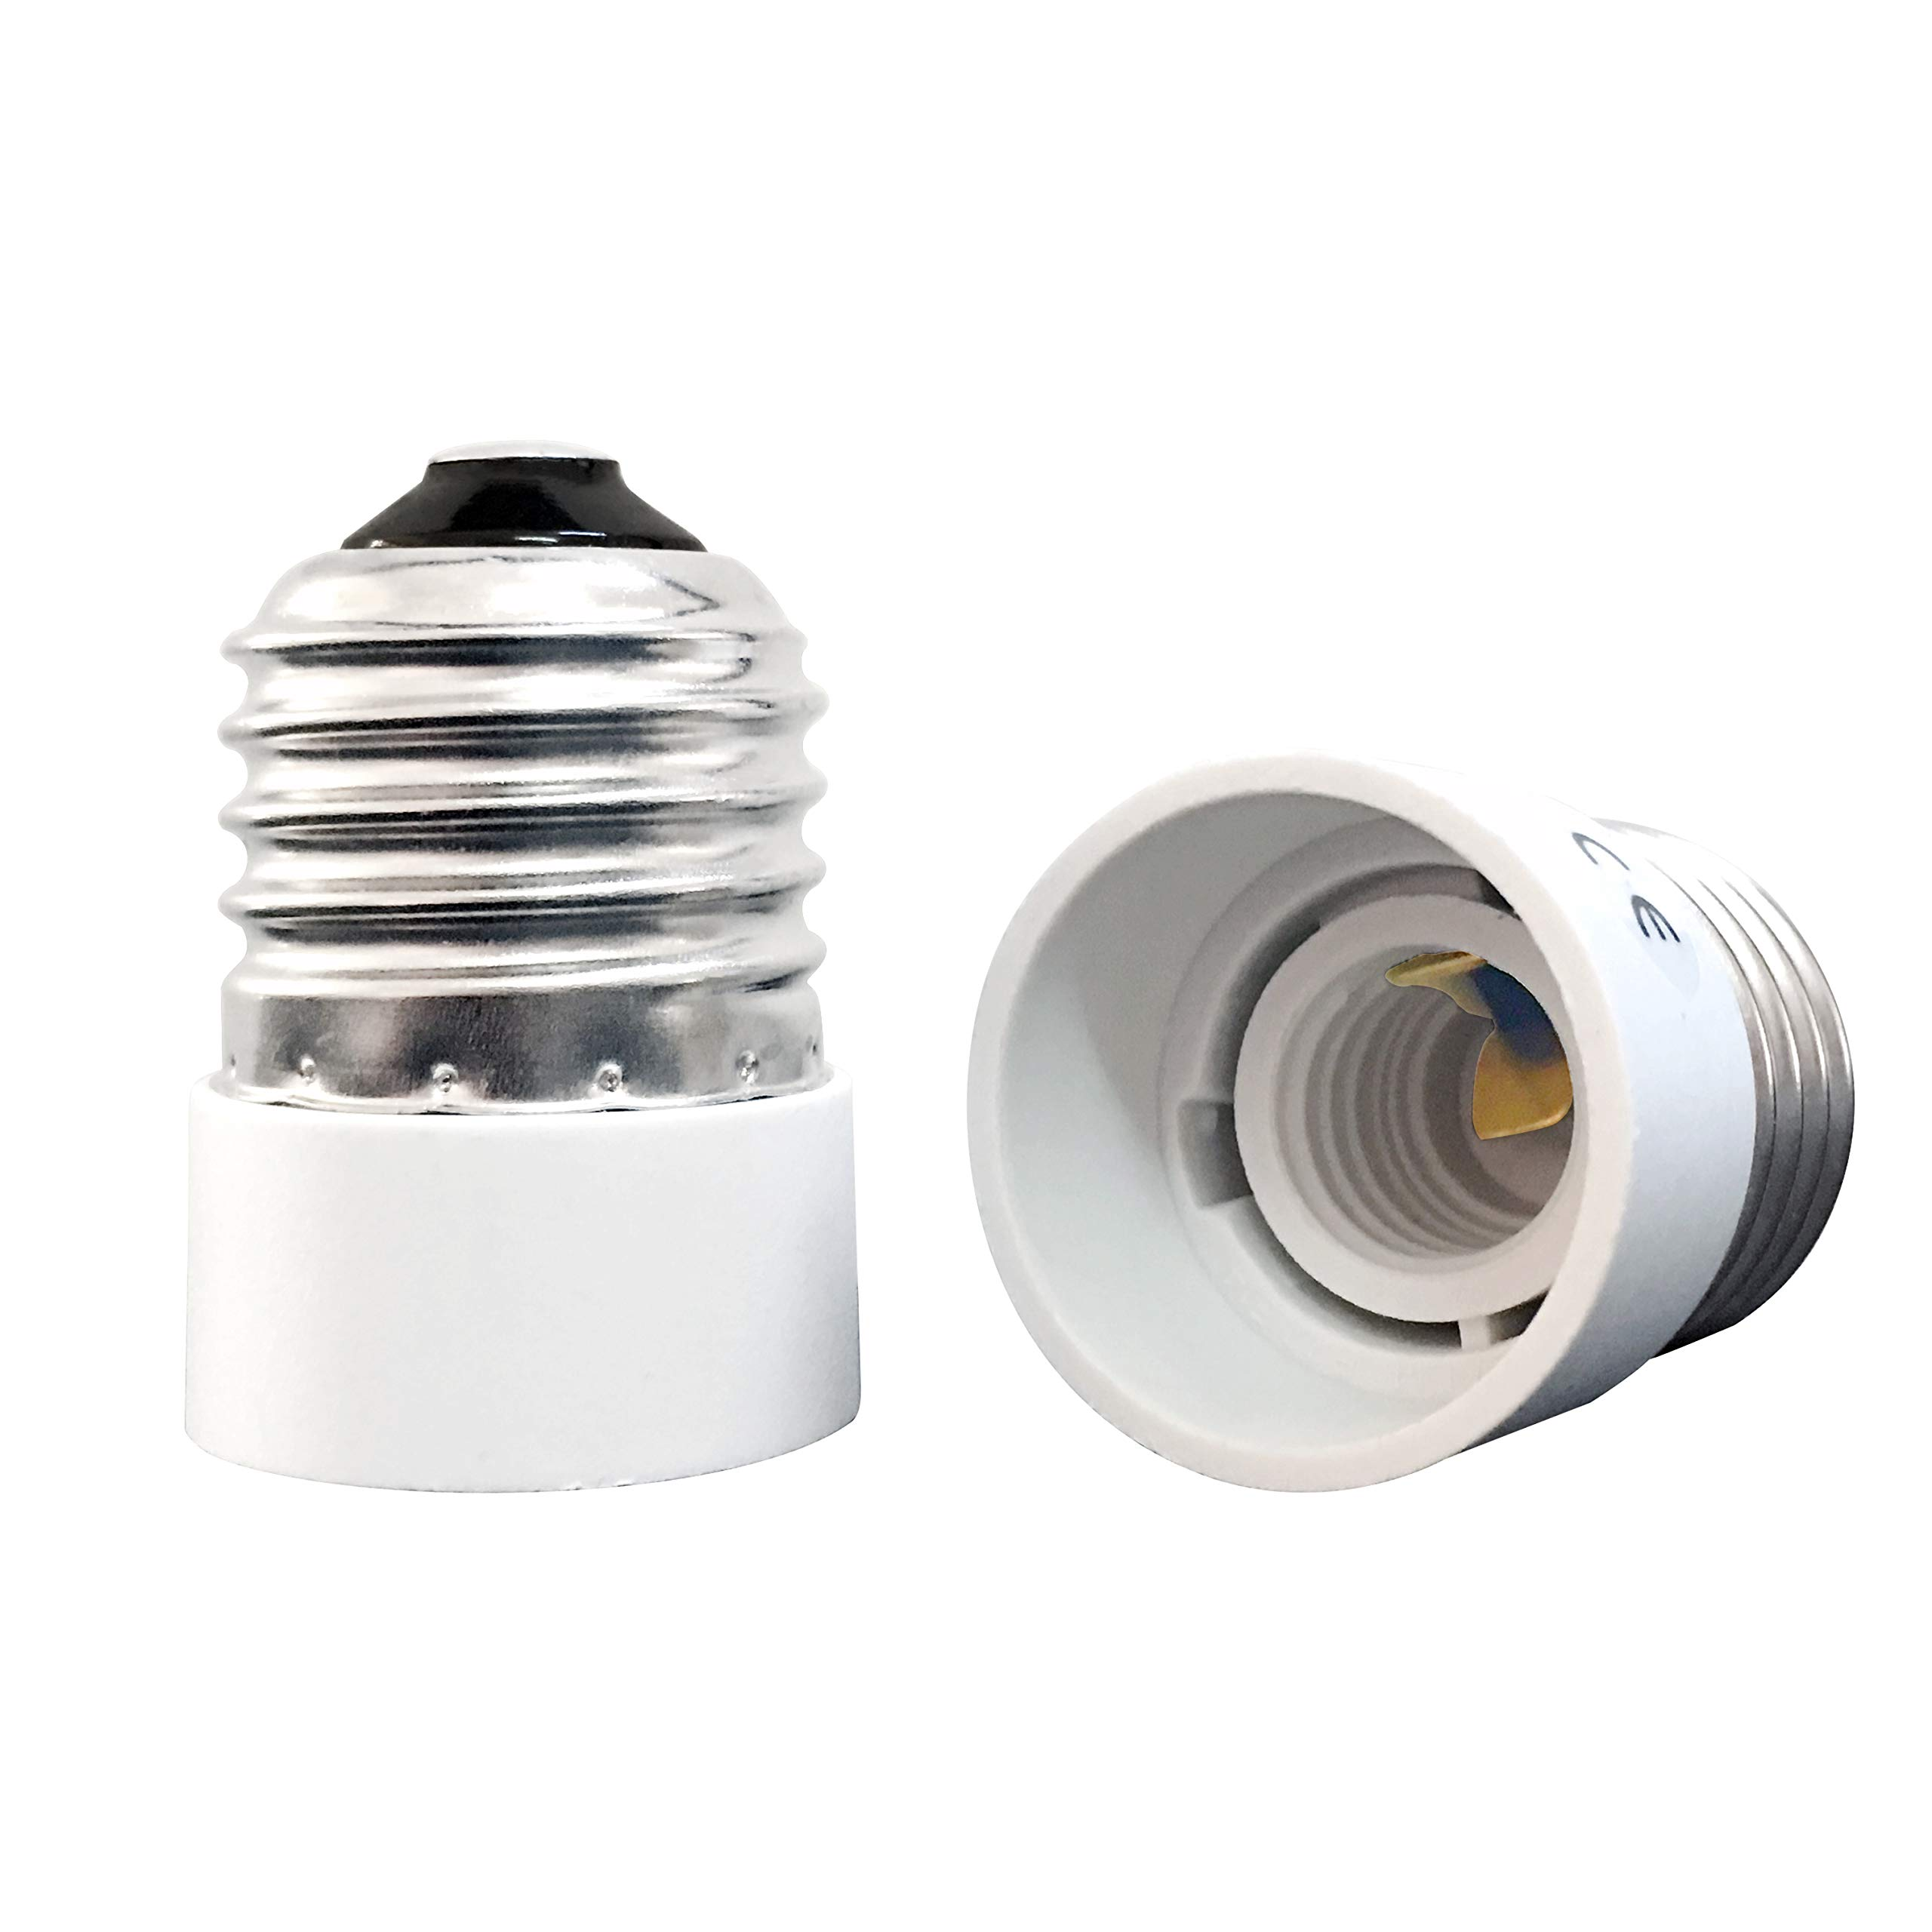 YAYZA! 2-Pack E26 E27 to E12 Bulb Base Adapter, Medium Edison Screw to Candelabra Light Socket Converter, Heat Resistant Up to 200℃ No Fire Hazard